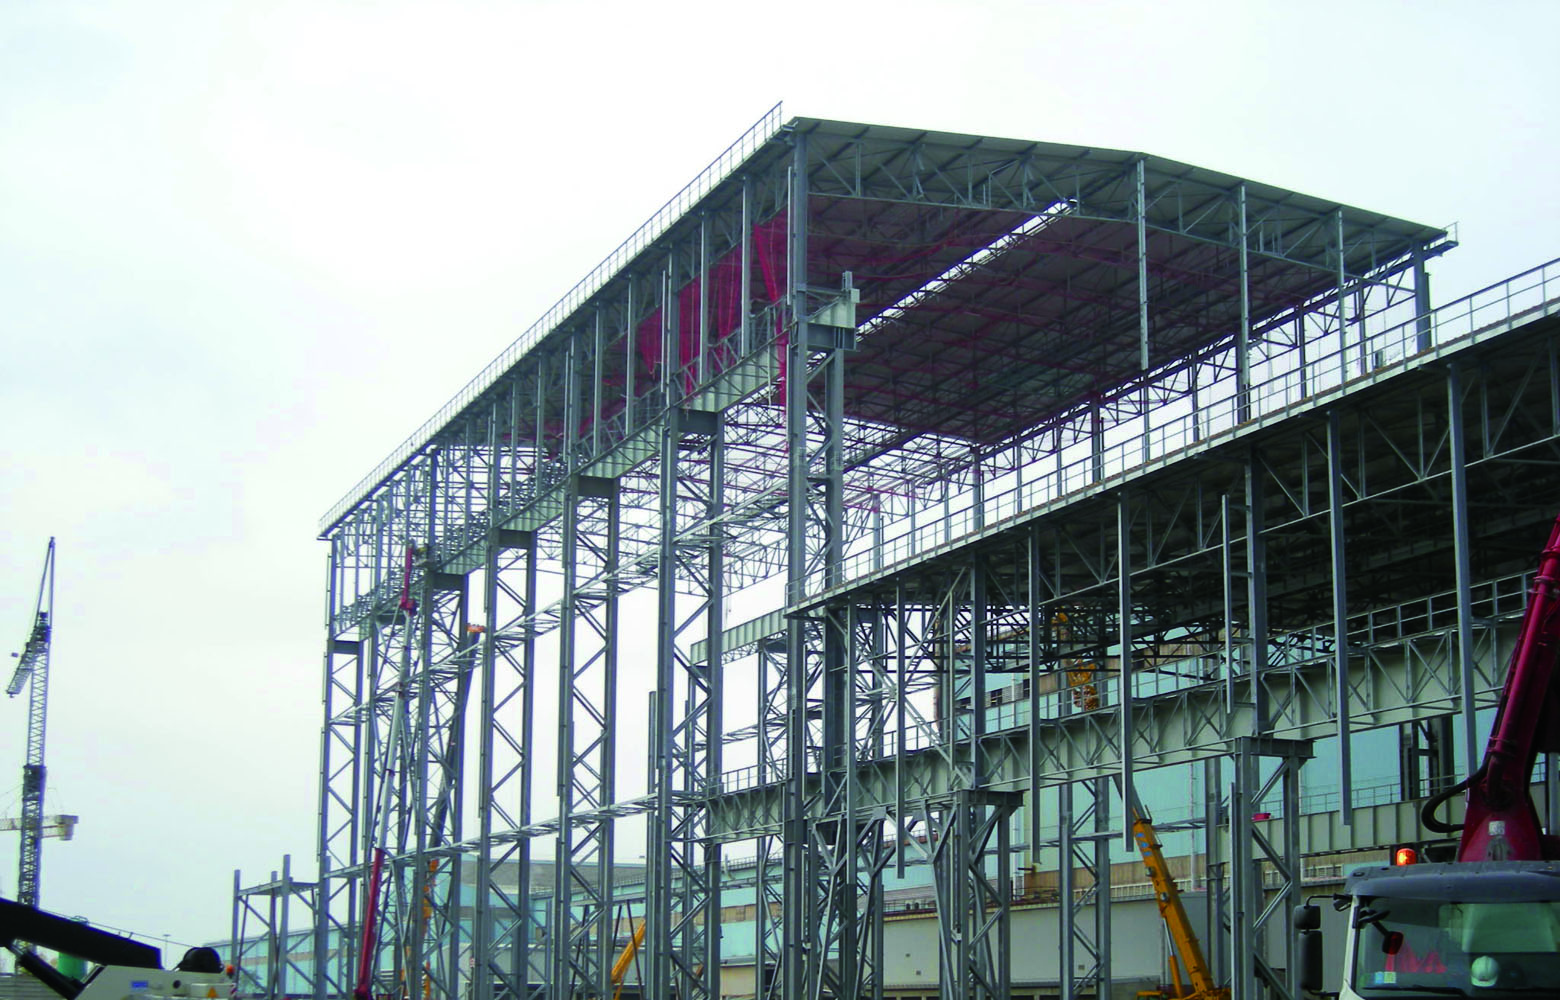 05 - 07 novembre 2008